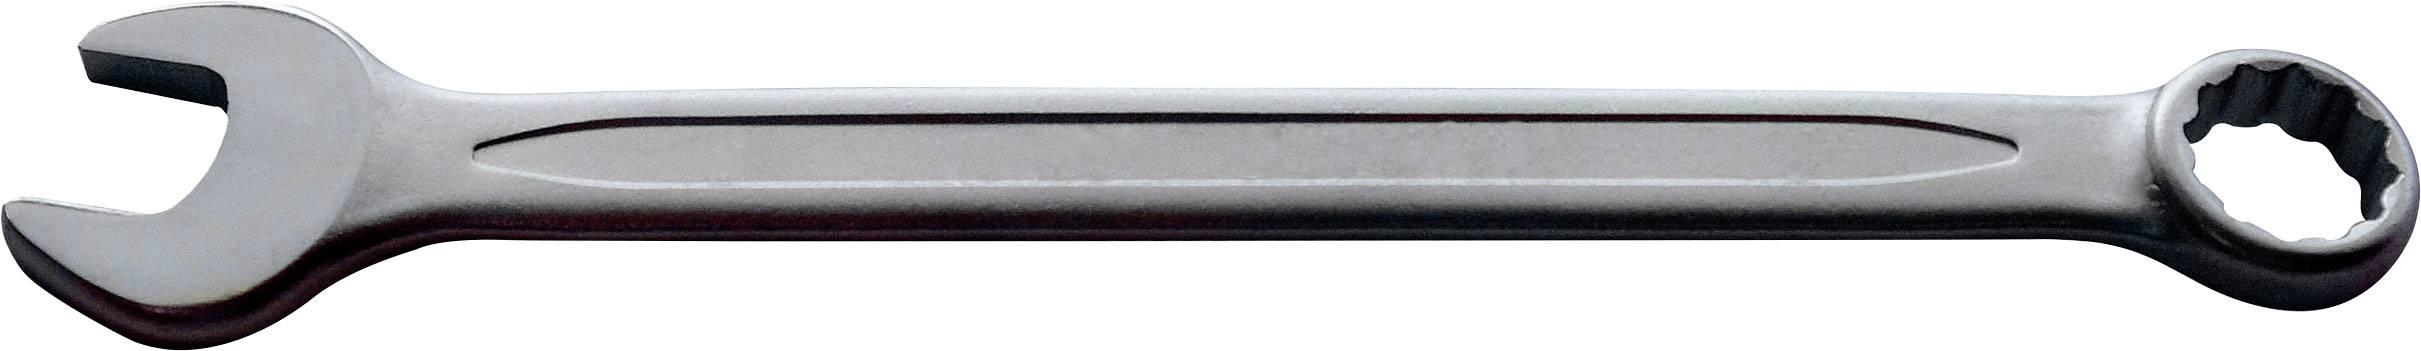 Očkoplochý kľúč/e TOOLCRAFT 820834, 10 mm